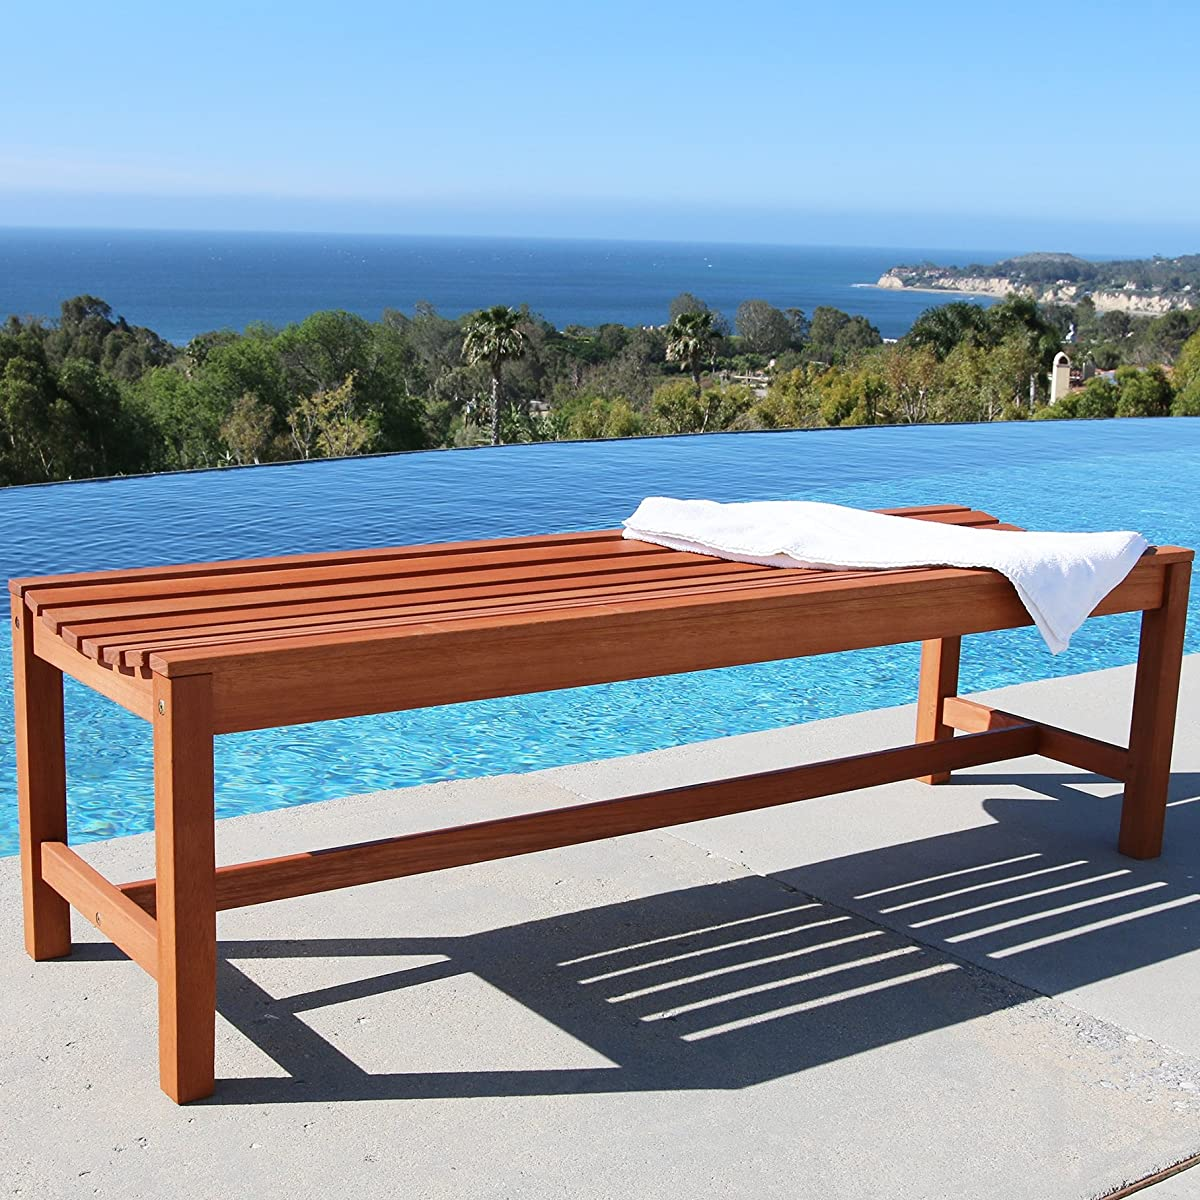 Vifah V025-1 Outdoor Baltic Wood Garden Backless Slatted Seat Bench, 5-Feet